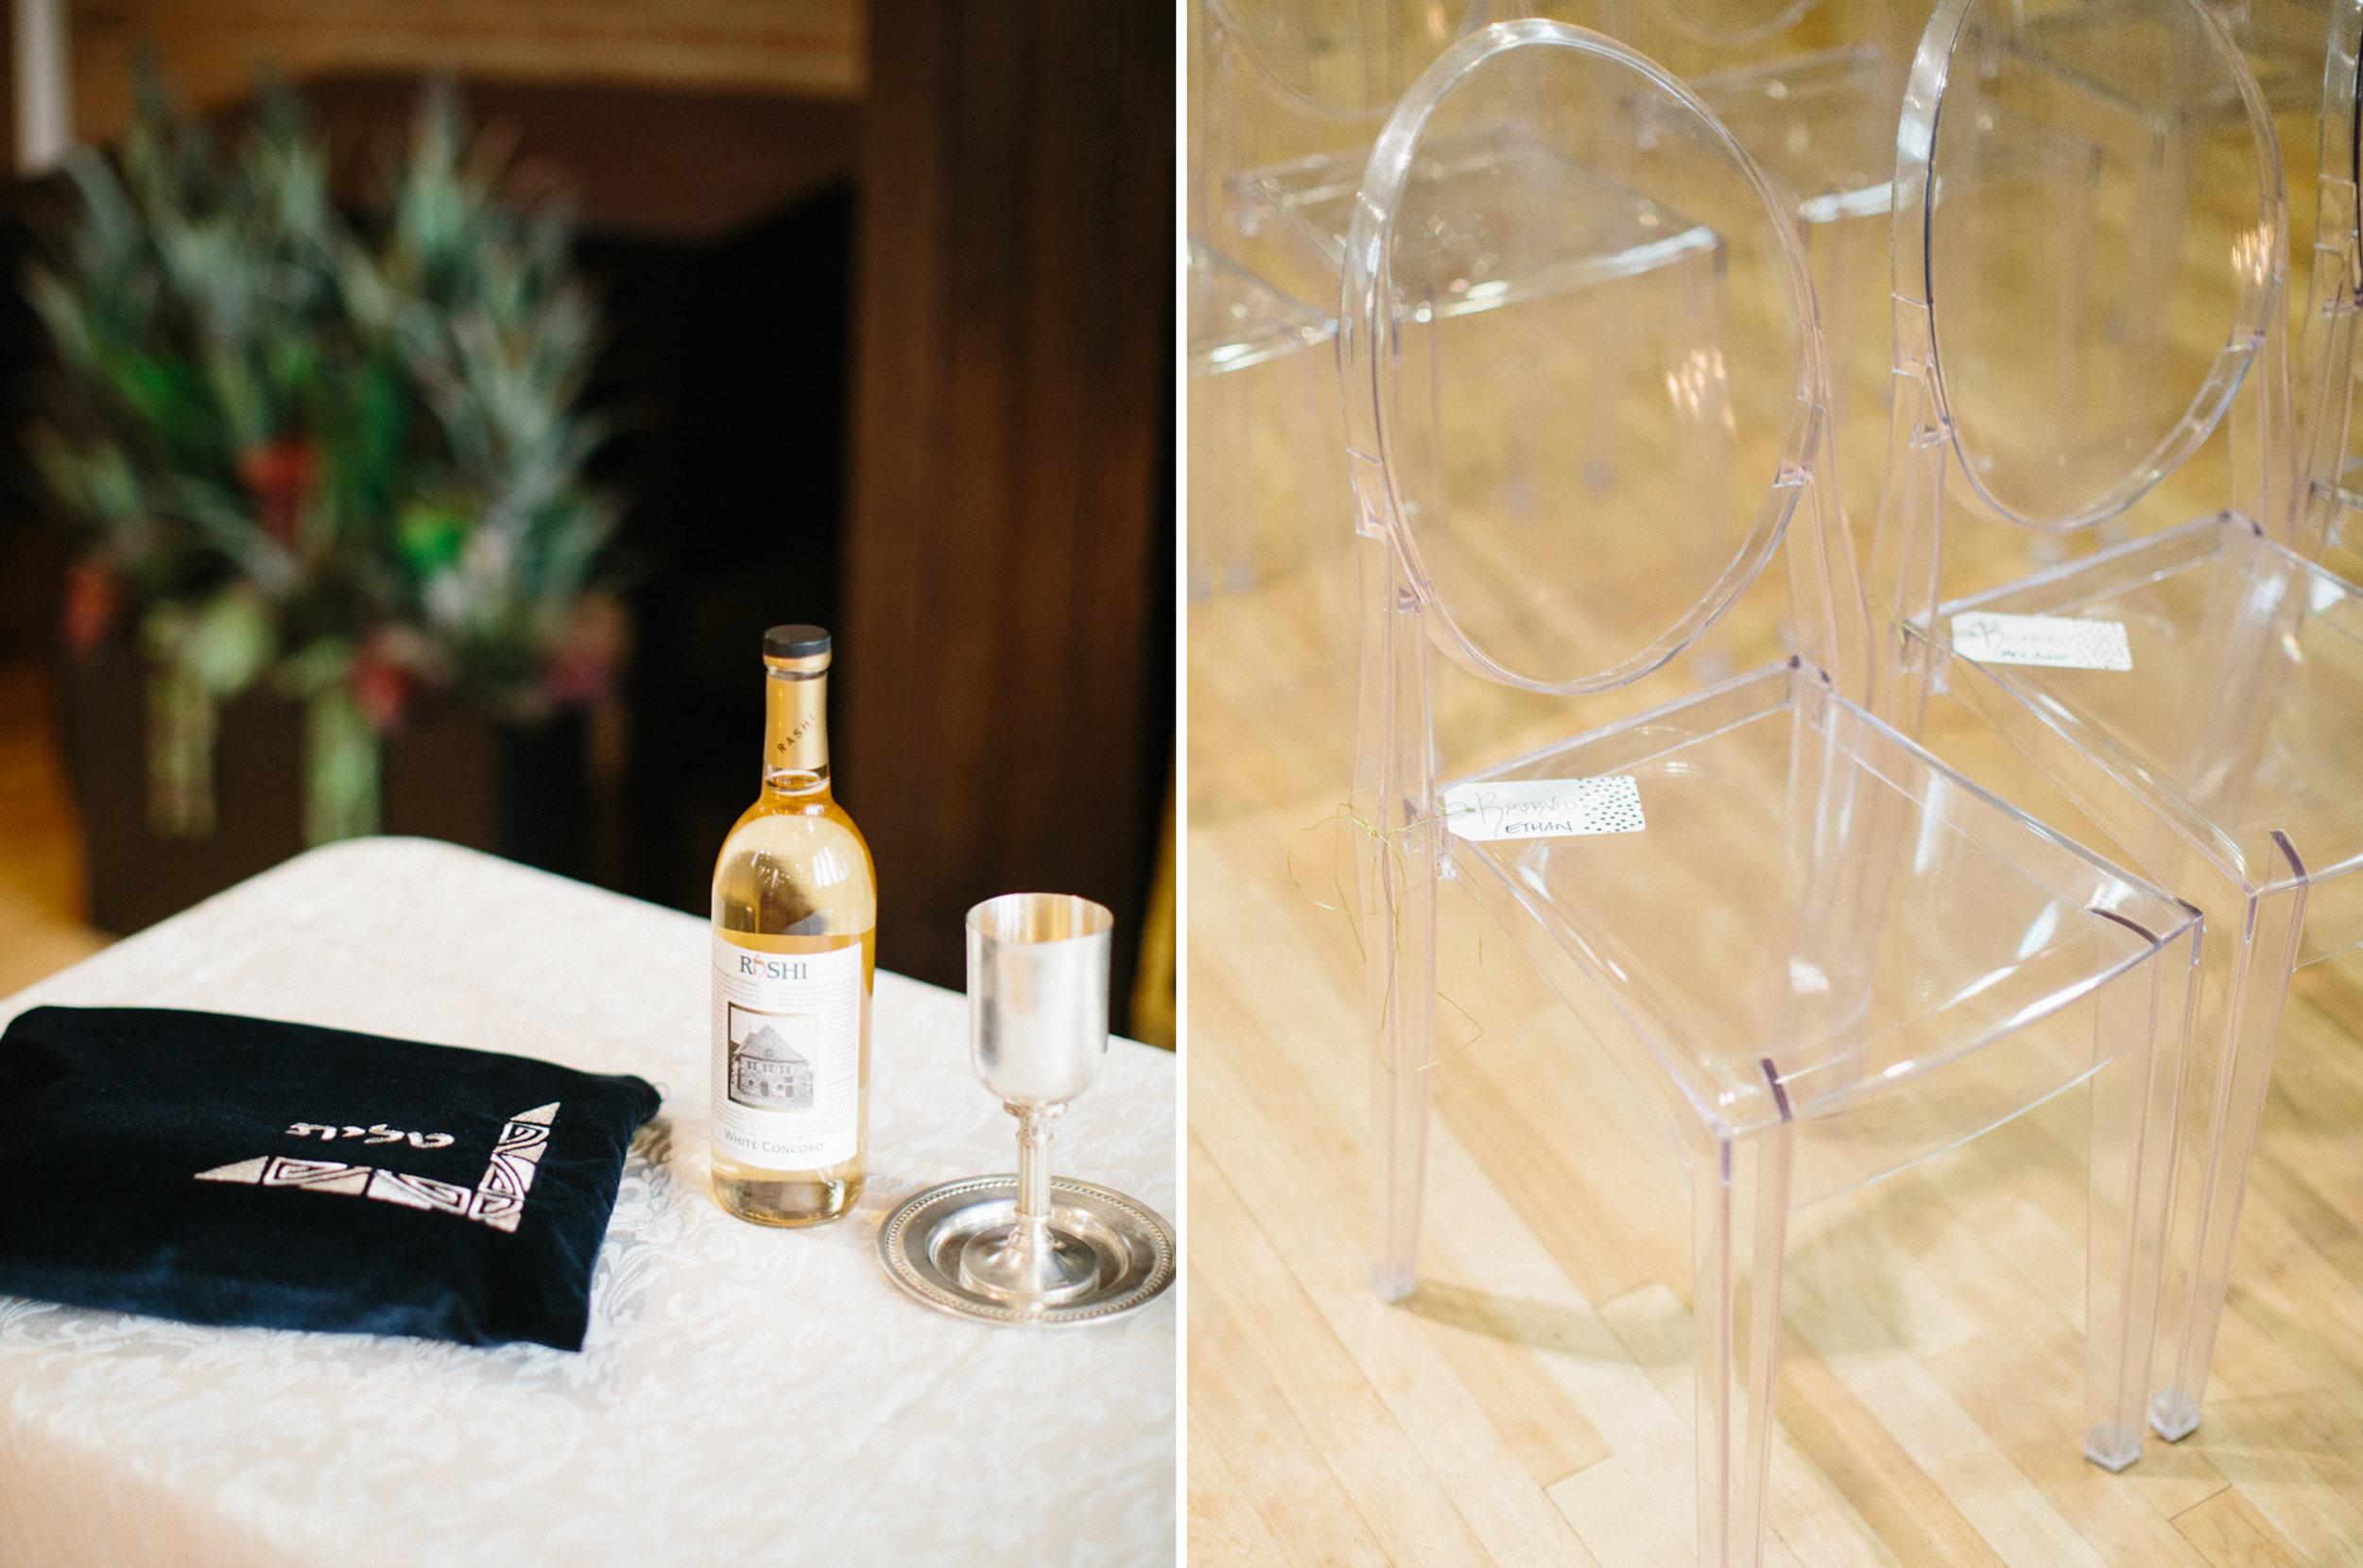 toronto_wedding_photographer_fine_art_the_great_hall10.jpg